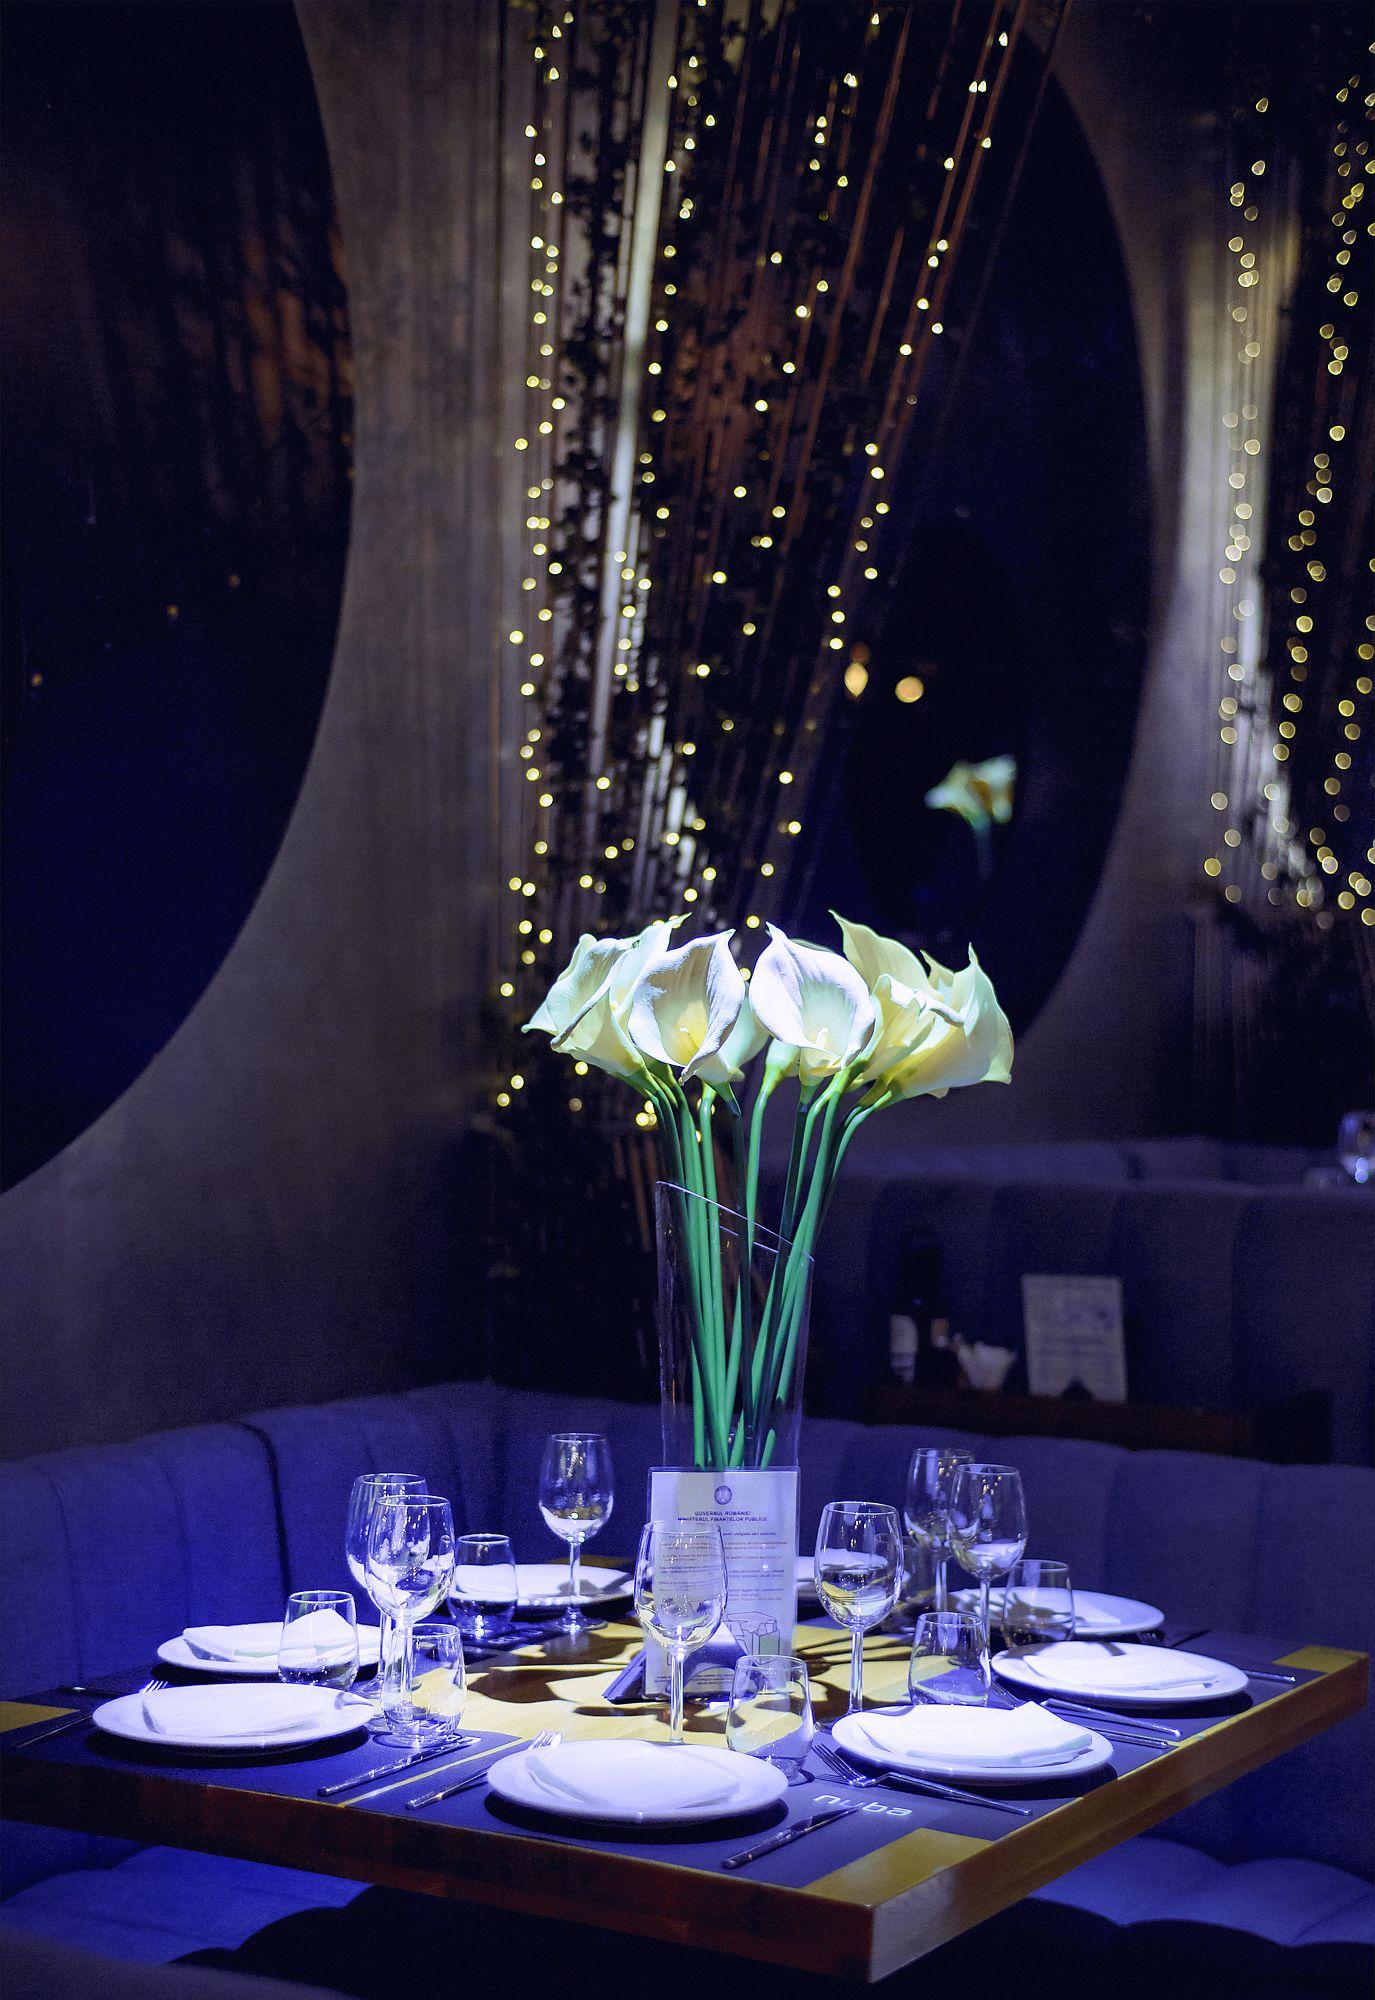 spalivingblog_nuba asian fusion cuisine restaurant (2)